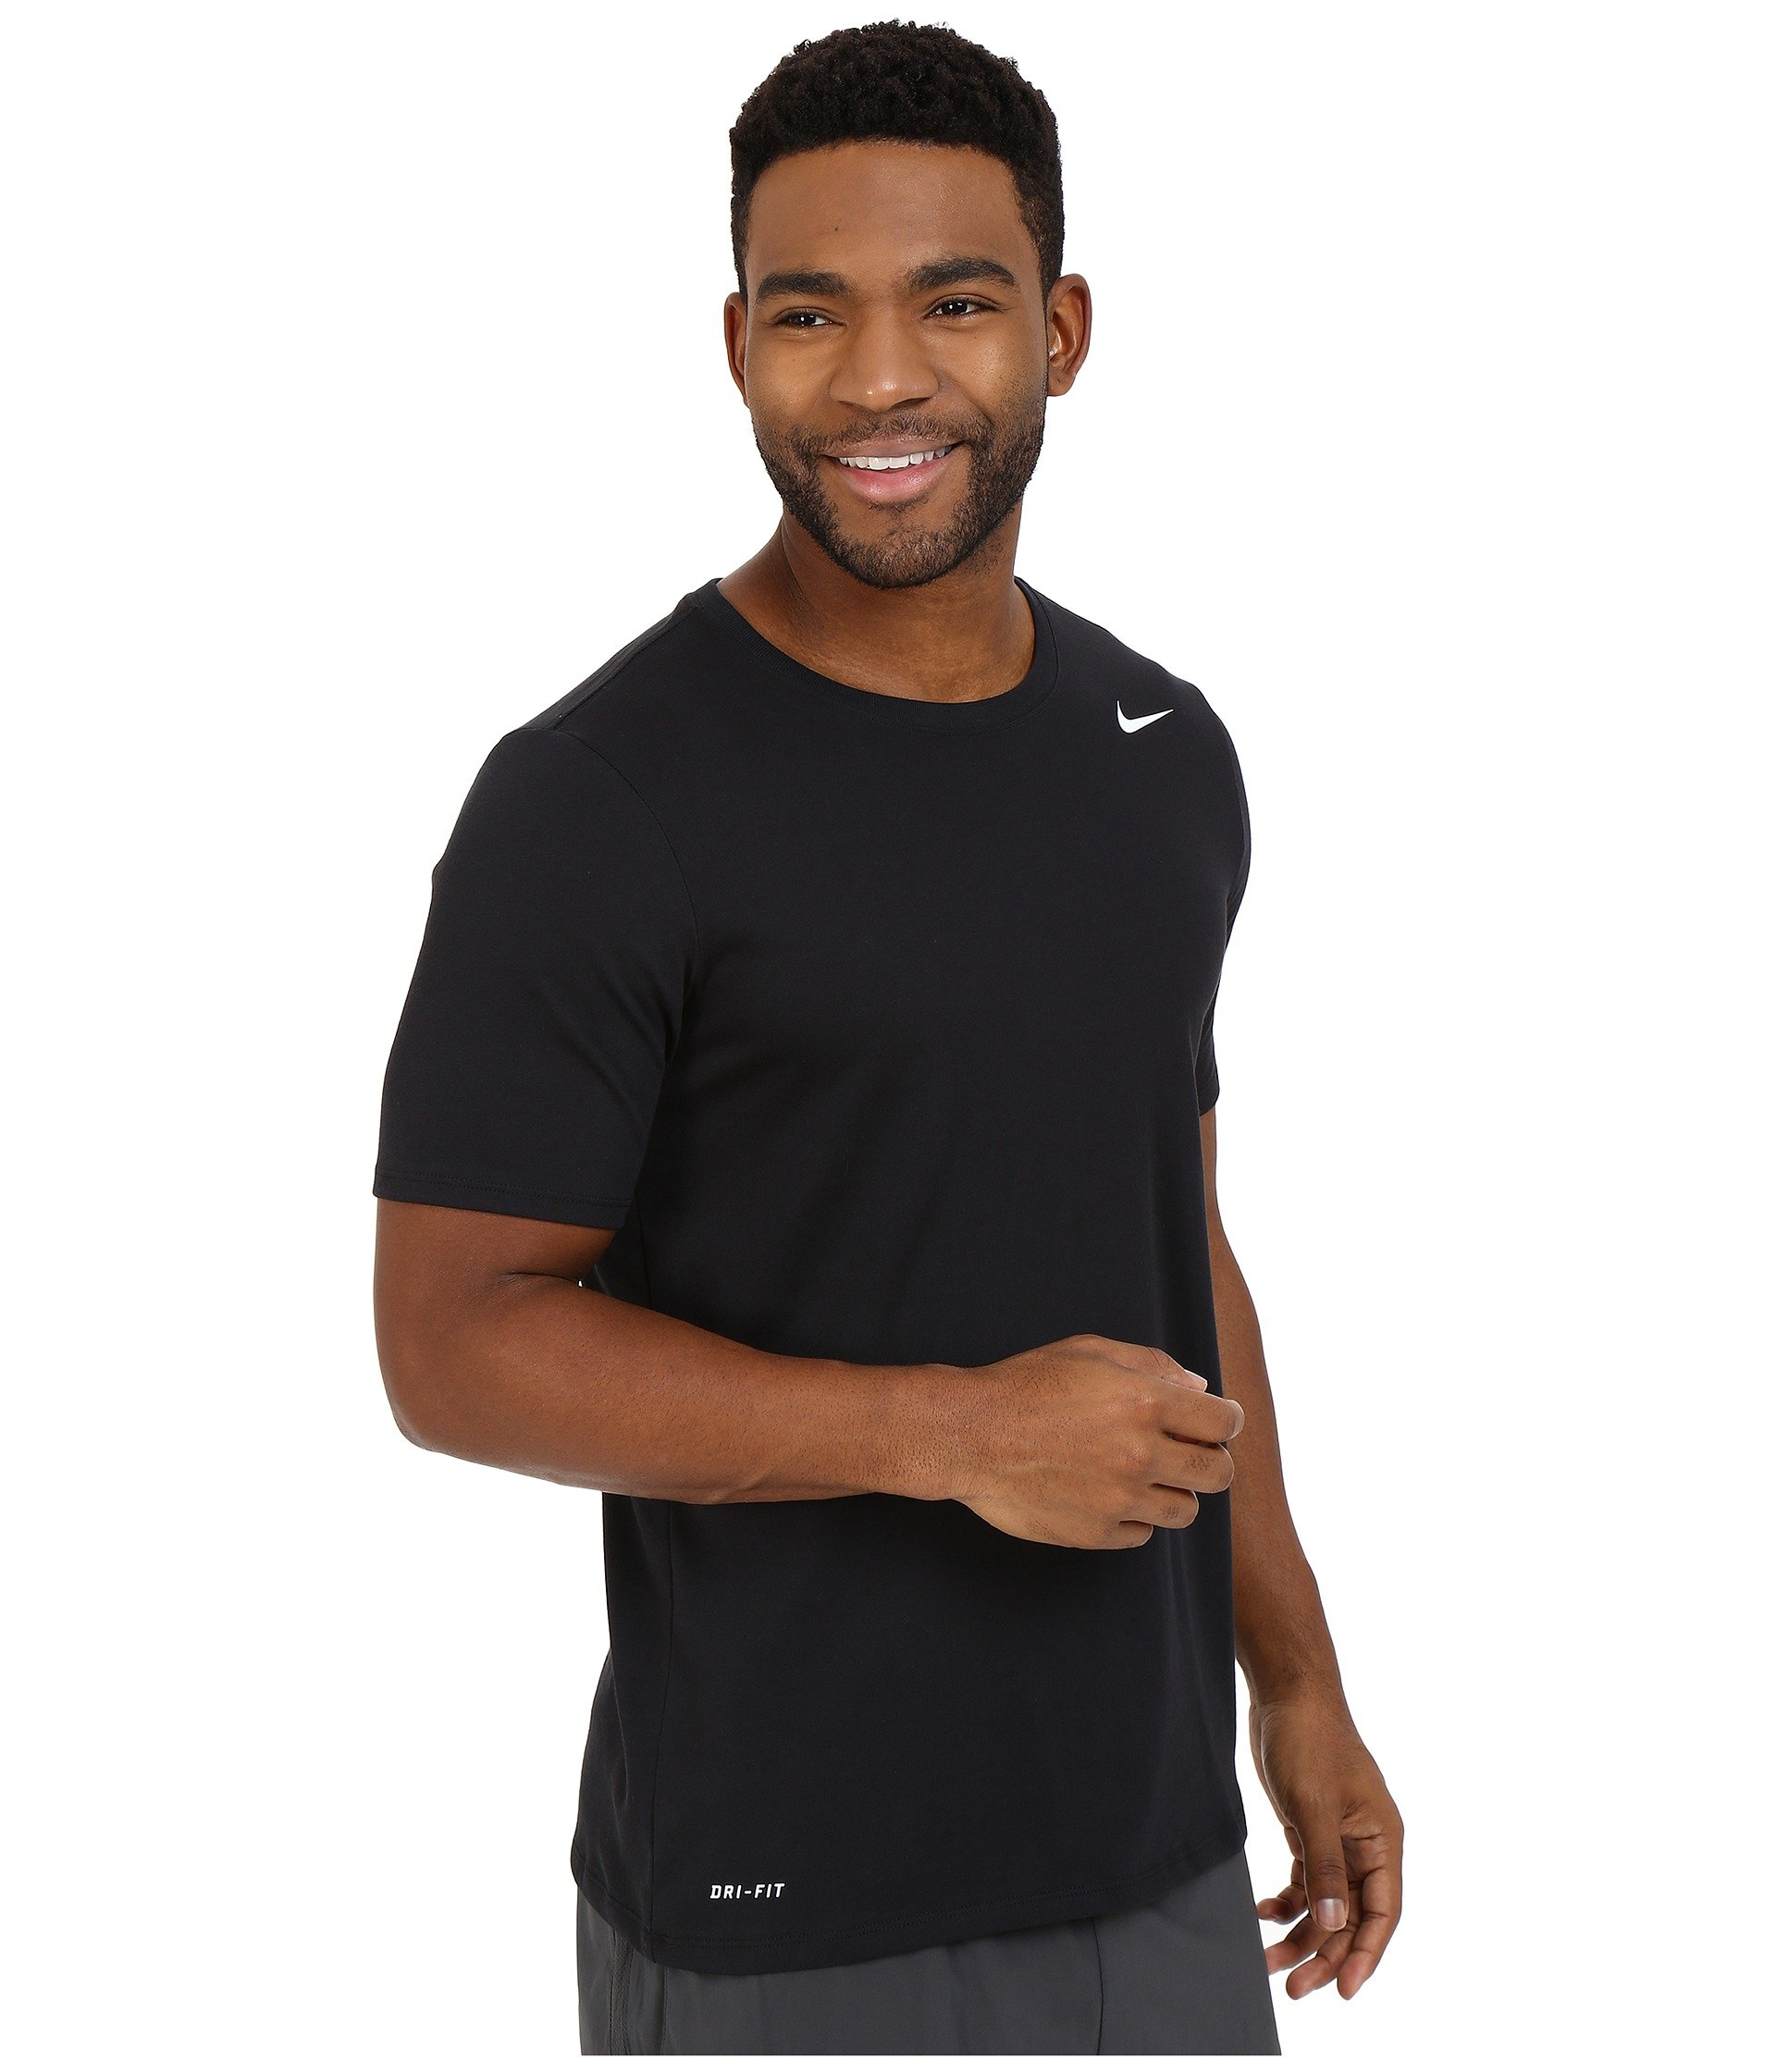 NIKE Men's Dri-FIT Cotton 2.0 Tee, Black/Black/White, Small by Nike (Image #5)